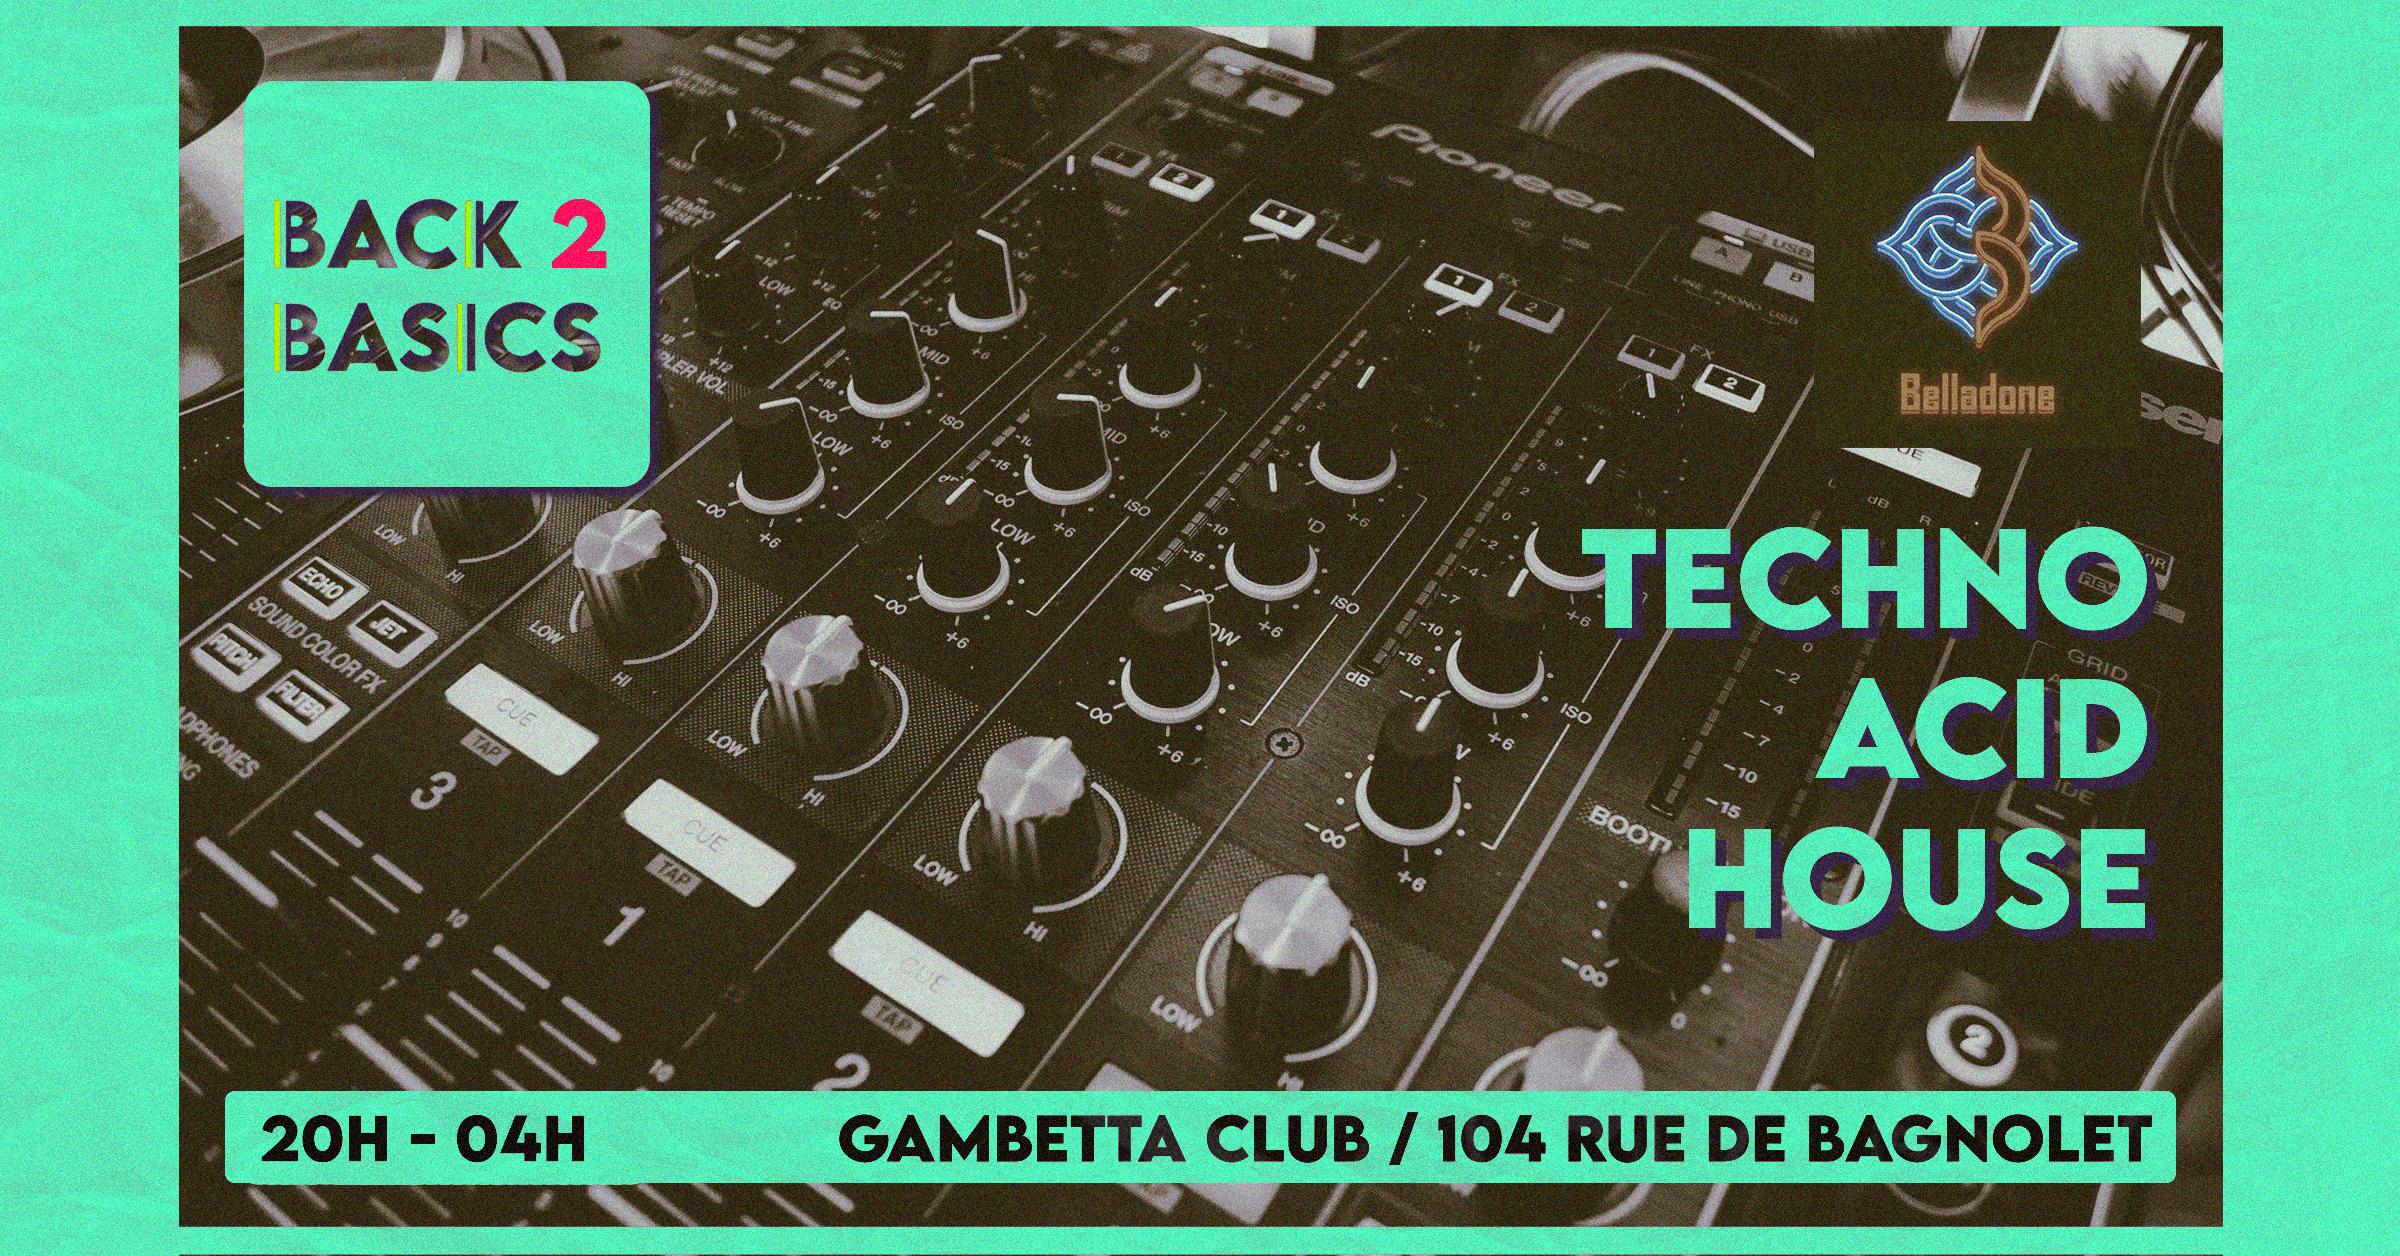 JEUDI 08/07 -Back To Basics - Techno/Acid/House